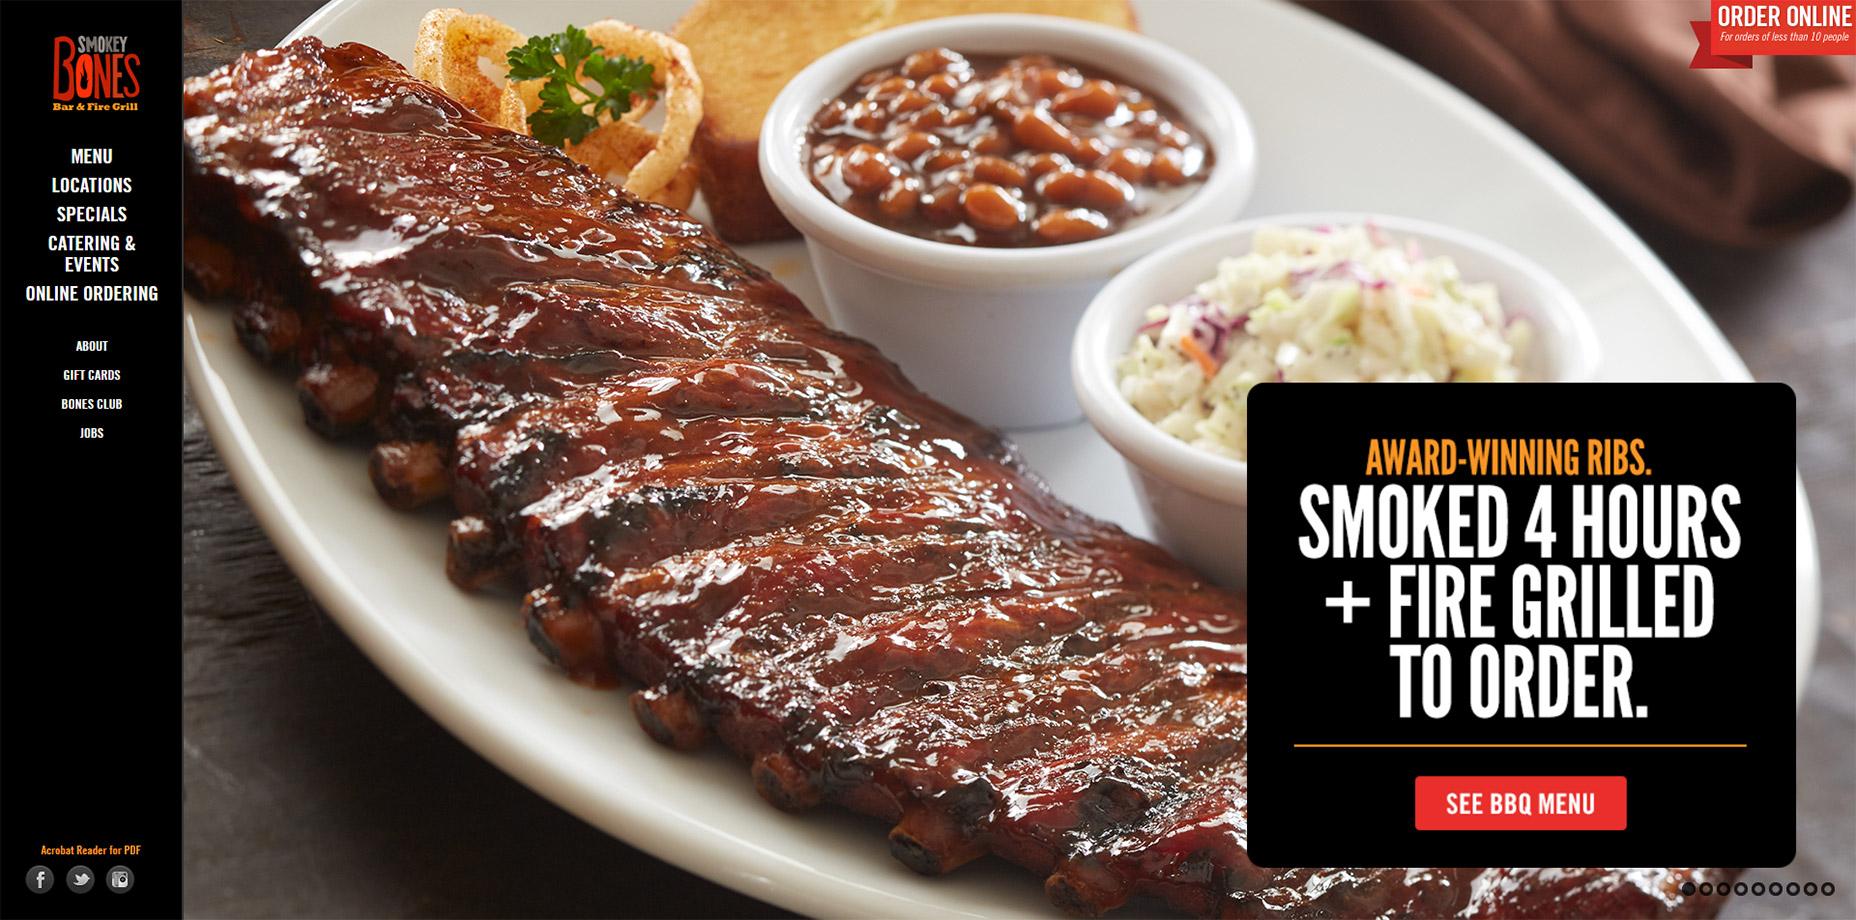 03-smokey-bones-restaurant ter plaatse